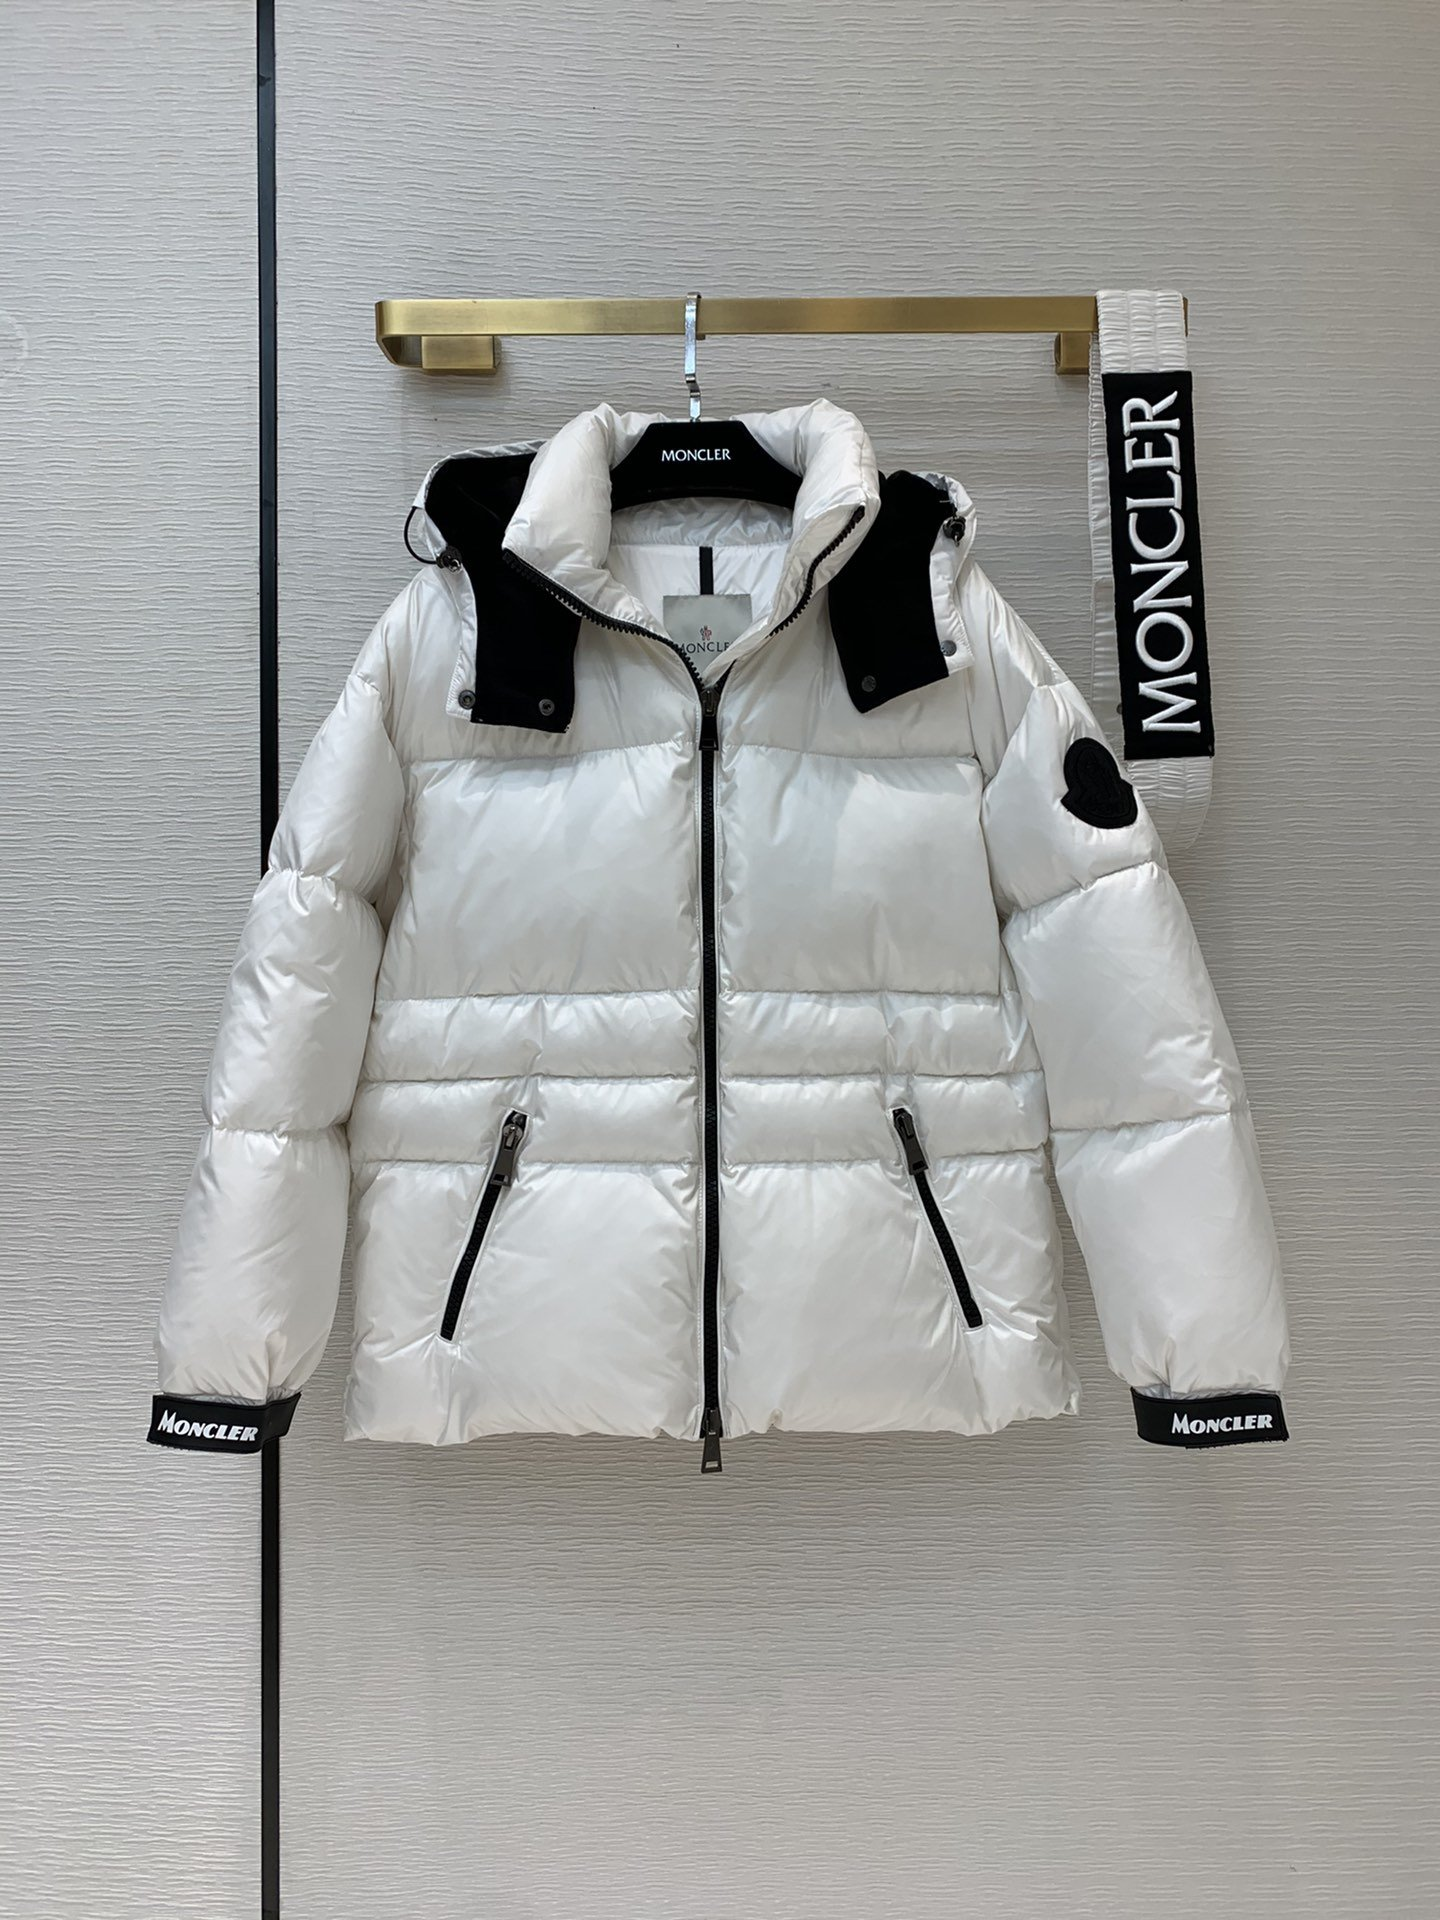 Фото Куртка 199940 - ukrfashion.com.ua